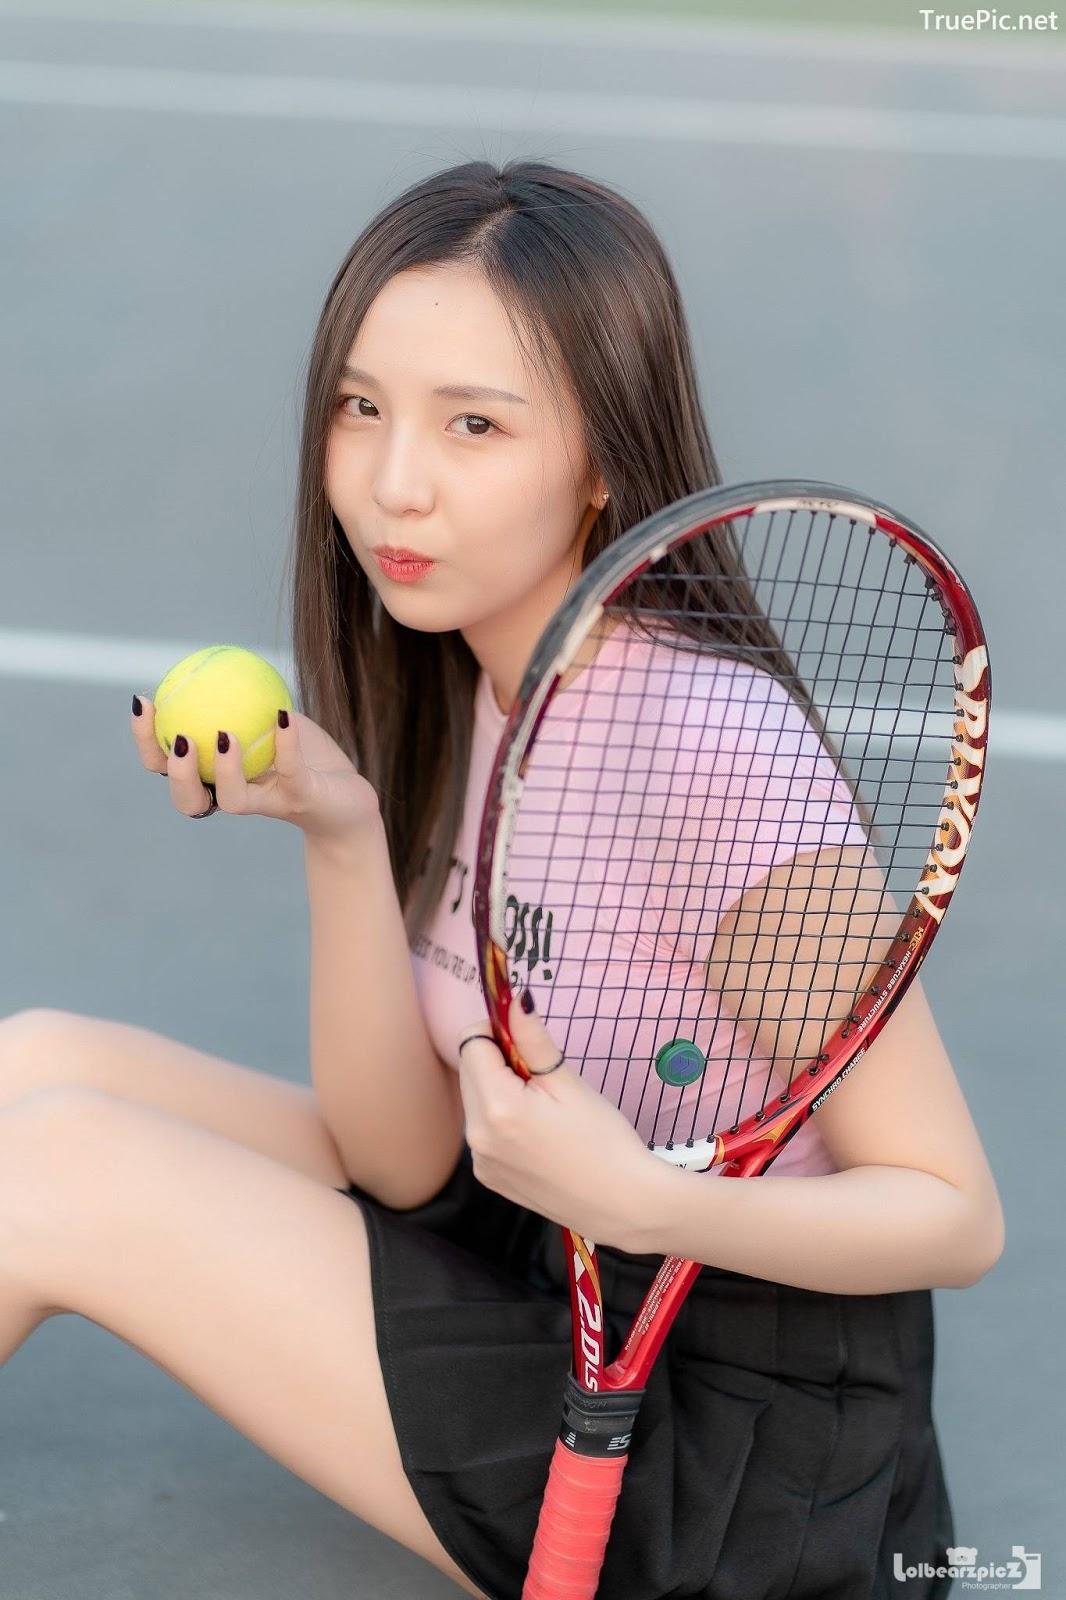 Image Thailand Model - Pattanan Truengjitrarat - Cute Sports Girl - TruePic.net - Picture-5